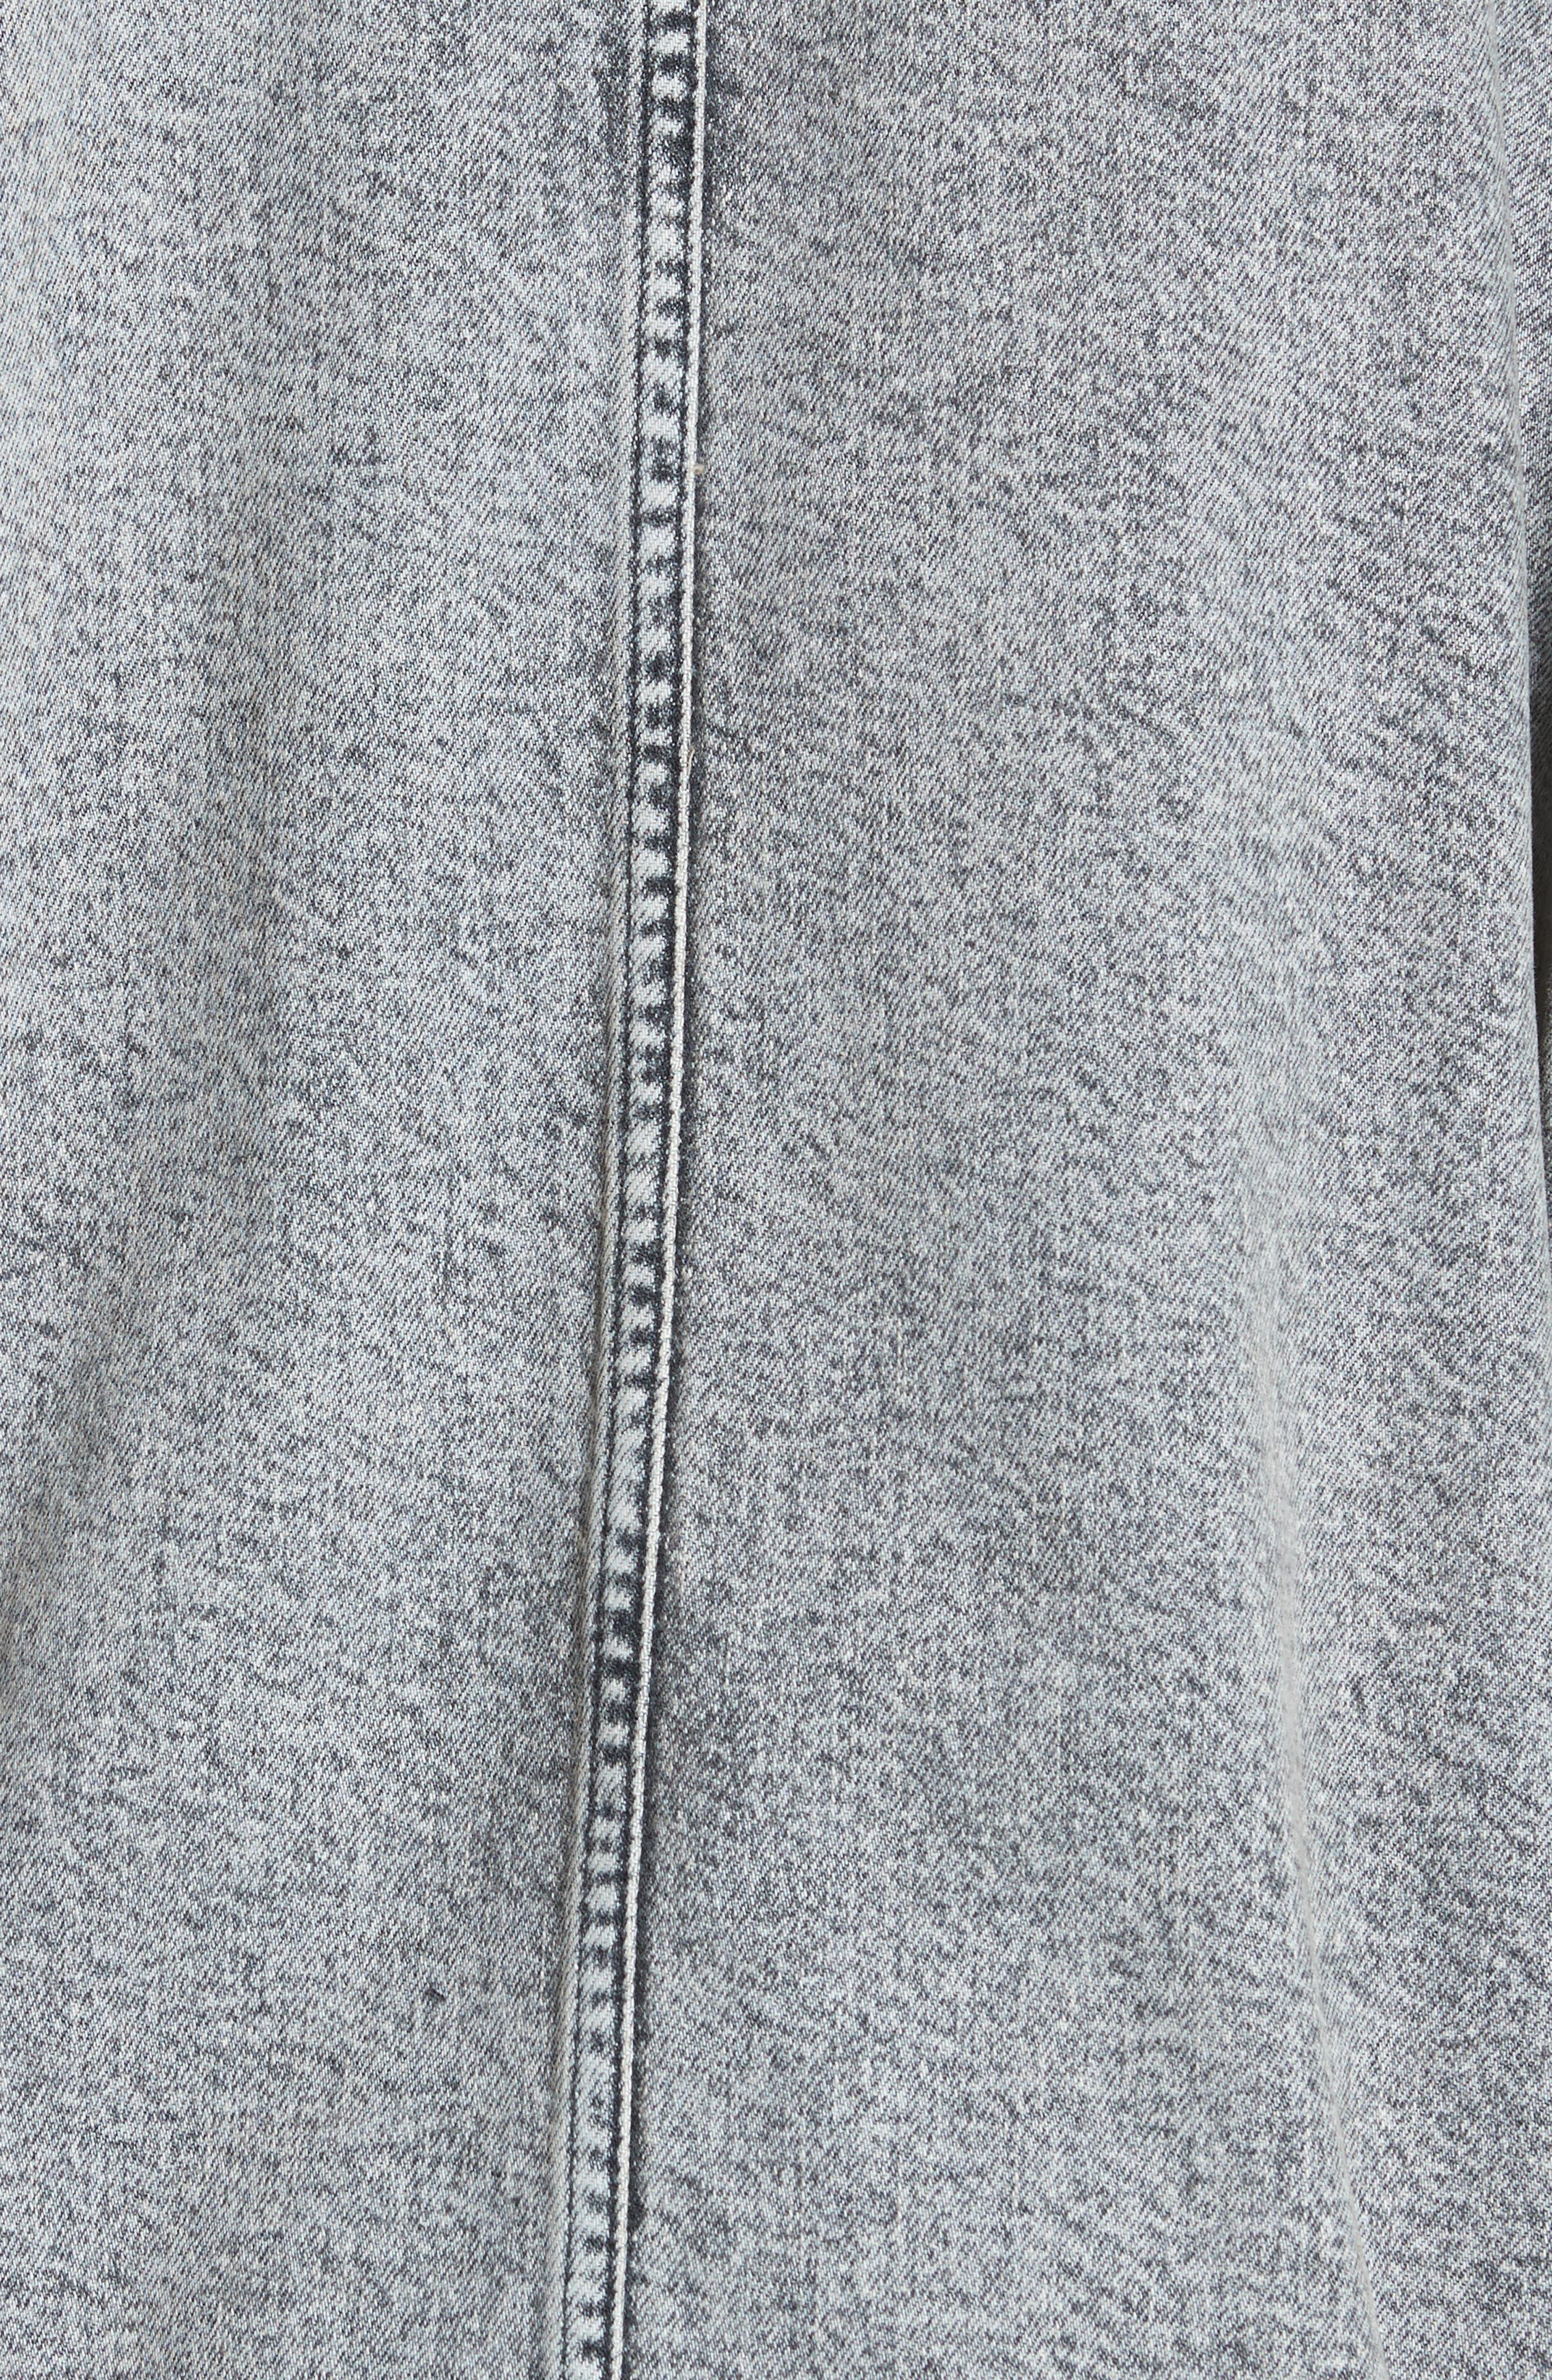 Acid Wash Oversize Denim Jacket,                             Alternate thumbnail 6, color,                             023